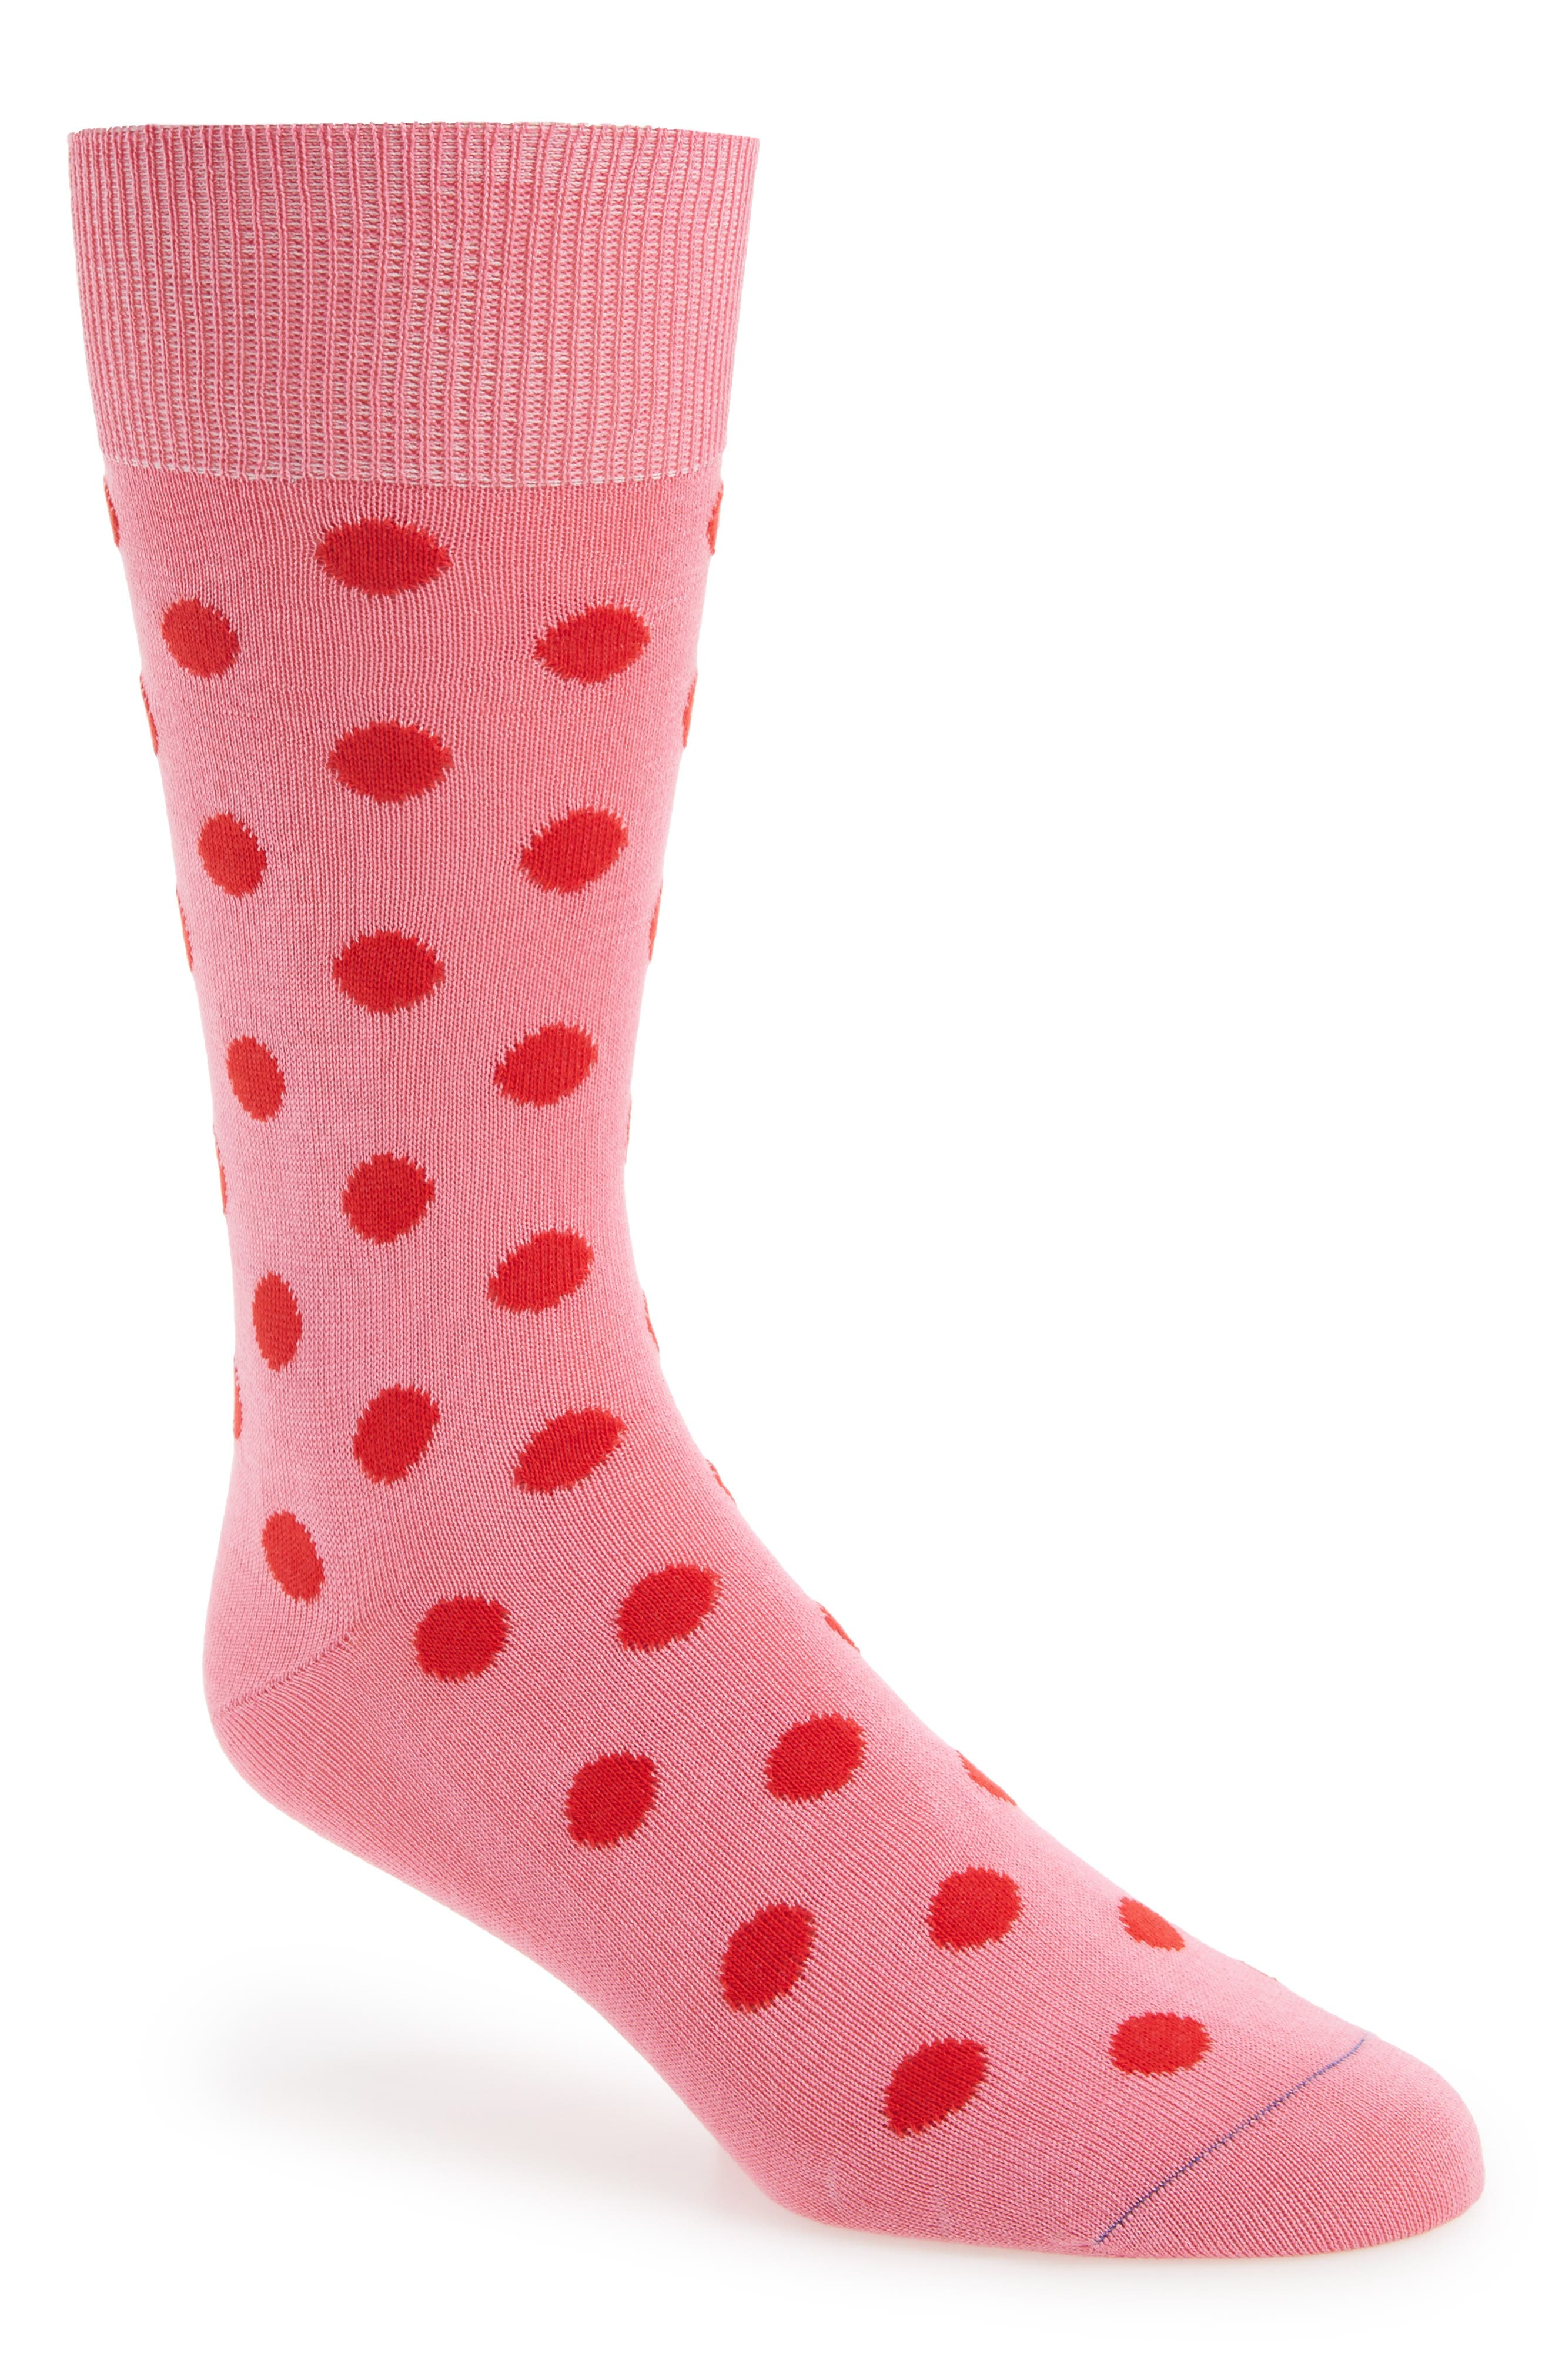 Paul Smith Bright Spot Socks